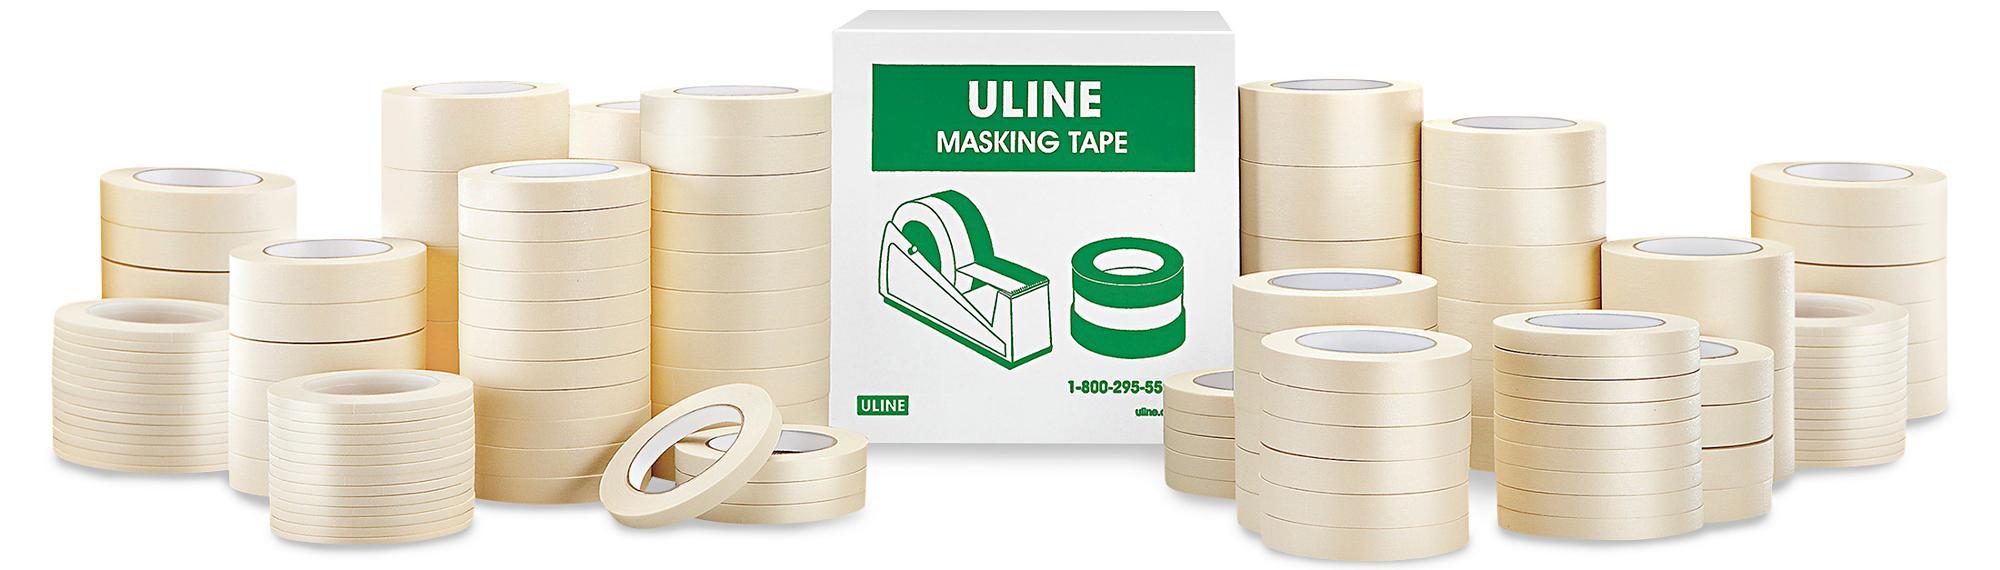 Uline Masking Tape